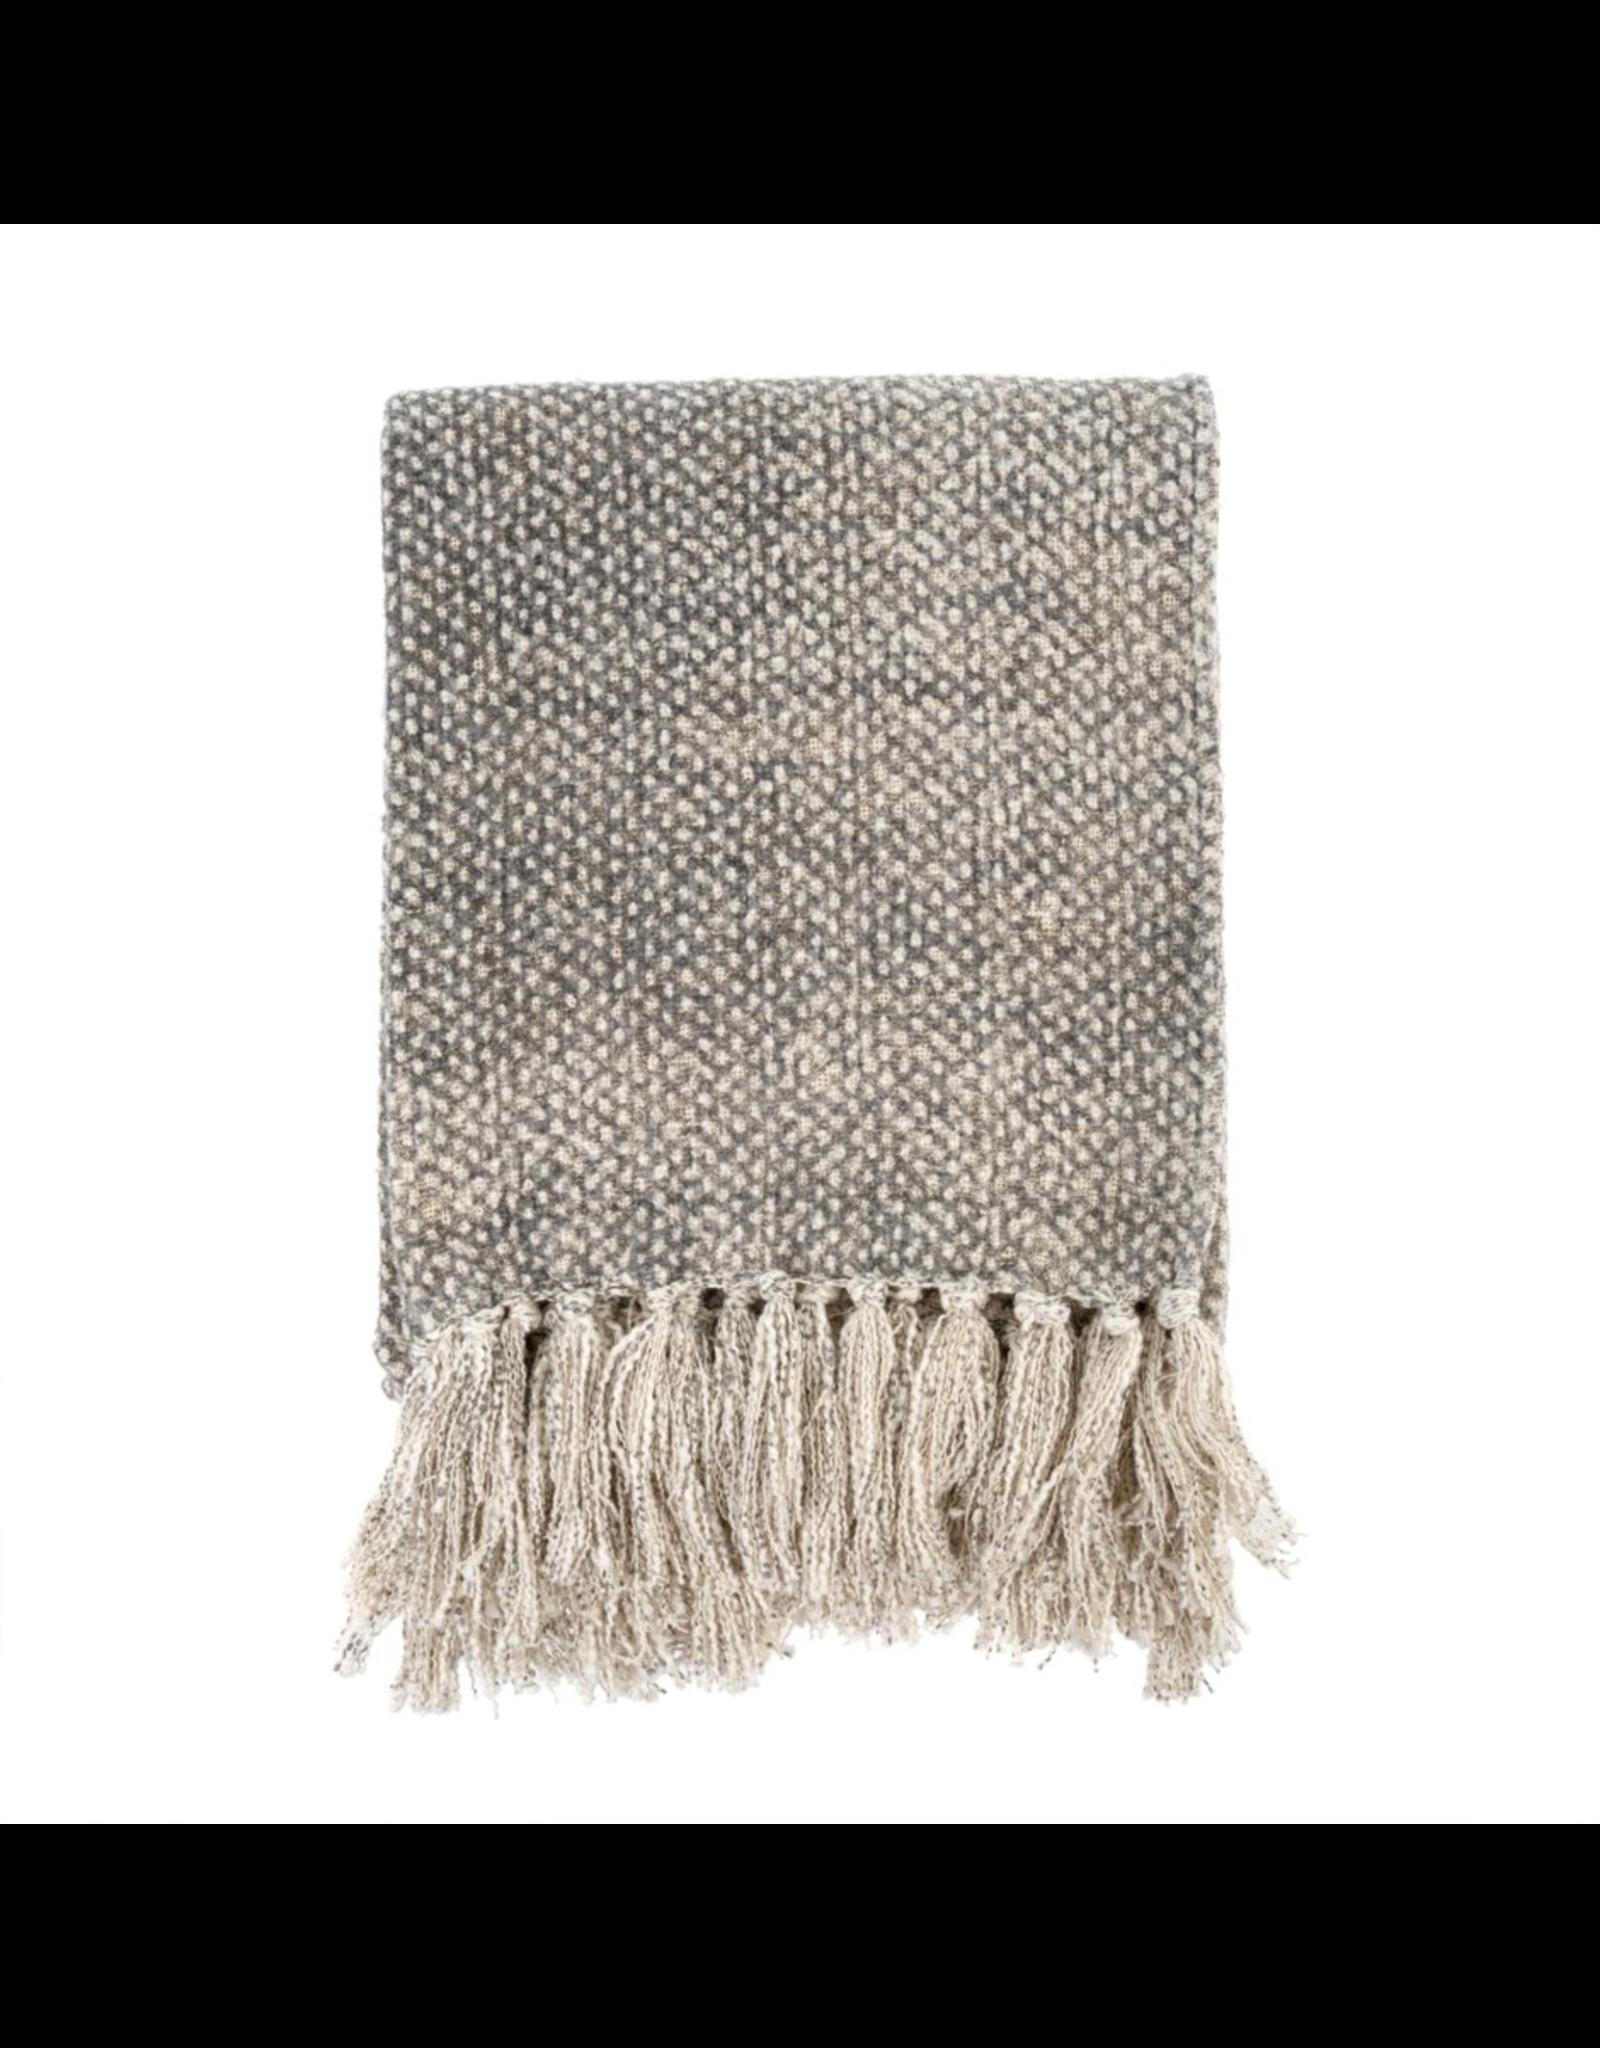 Cotton Tassle Throw - Dotty